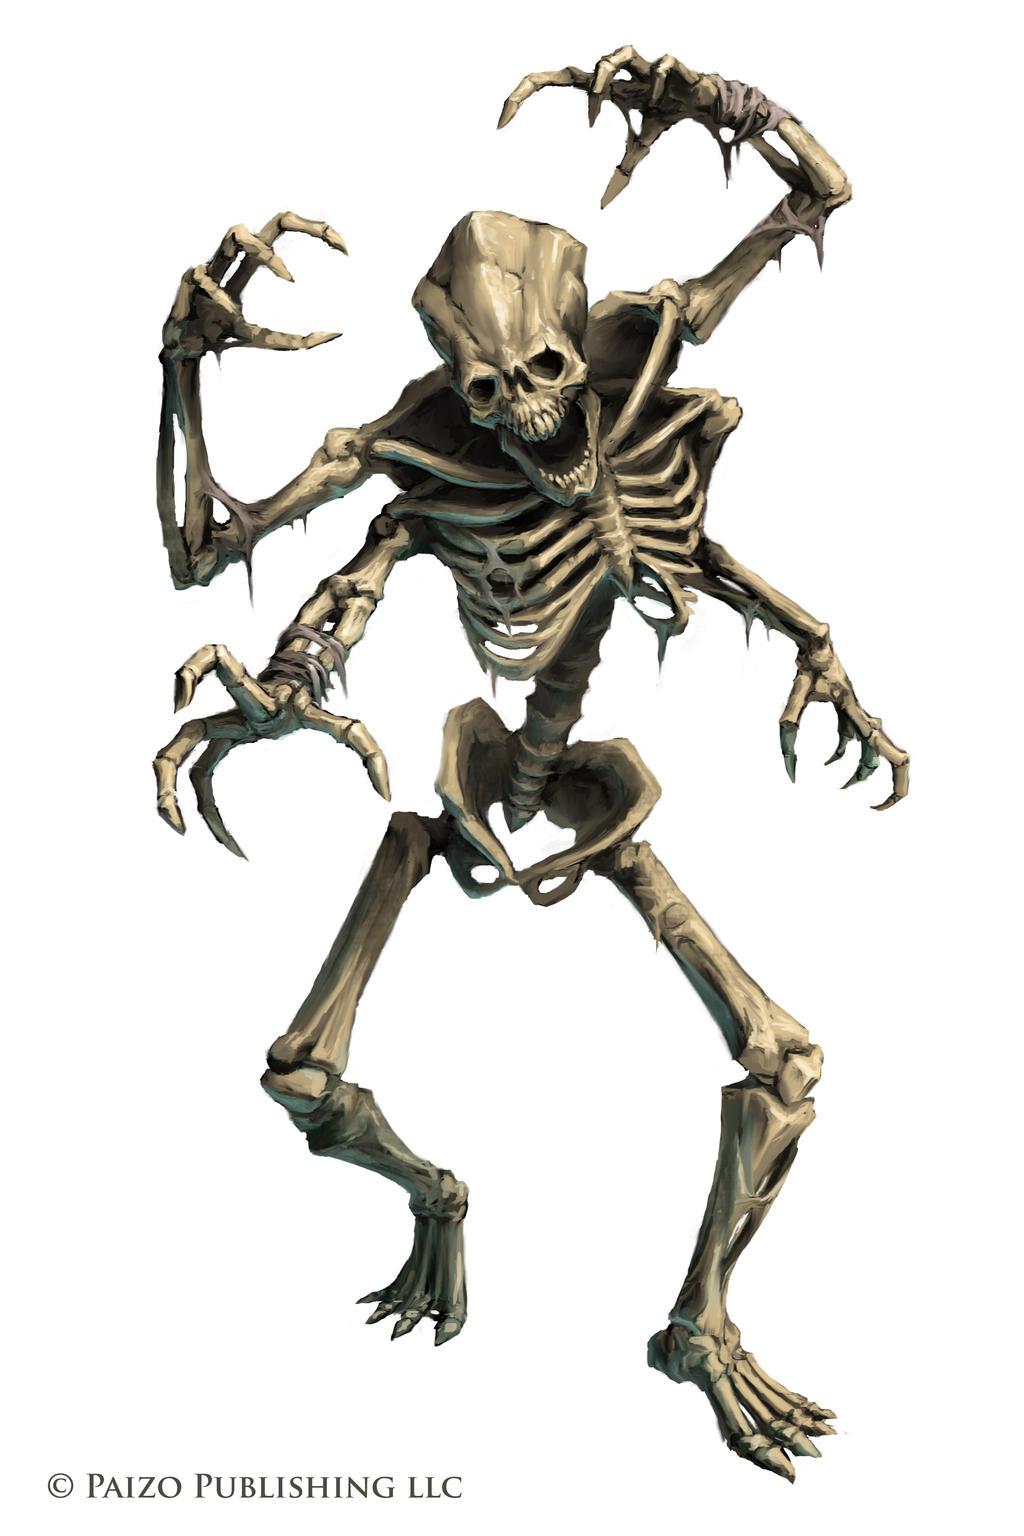 Pathfinder: Kasatha Skeleton by WillOBrien on DeviantArt